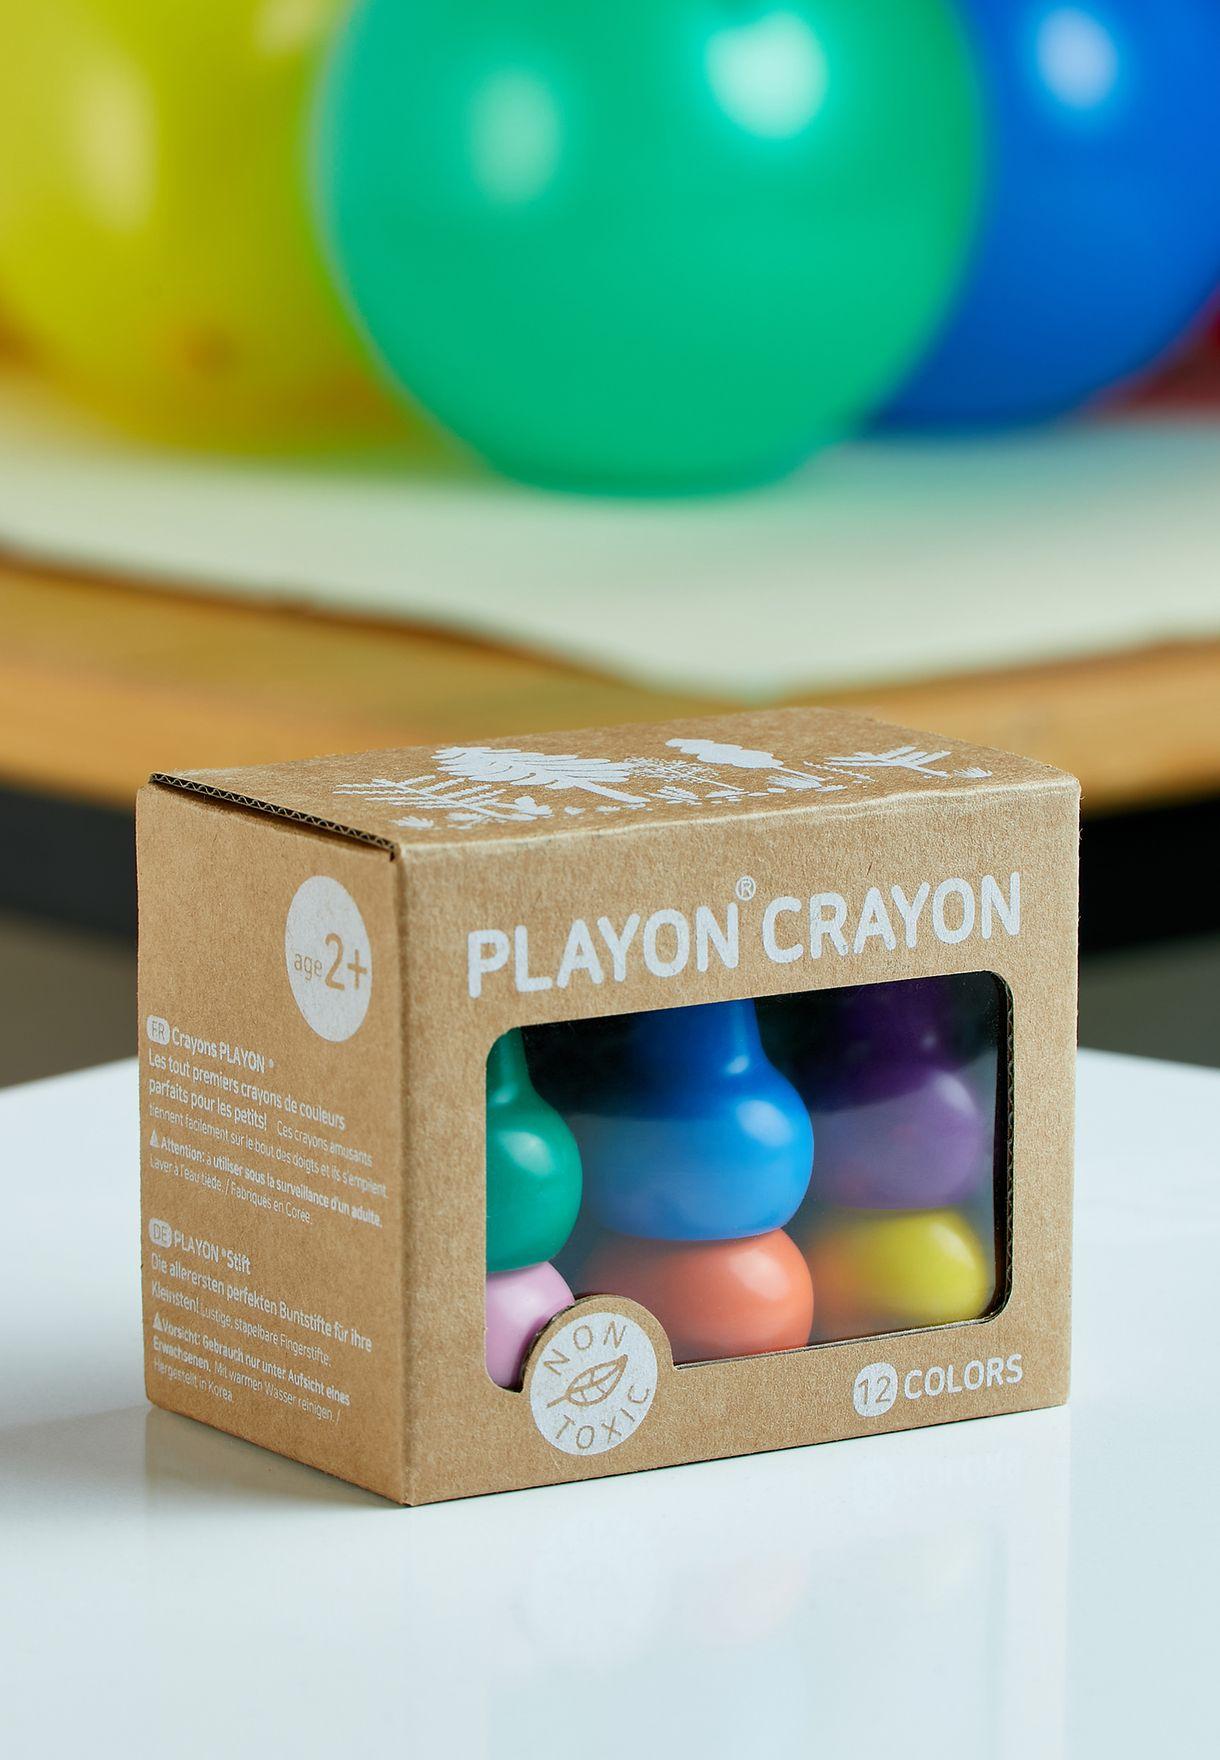 Playon Crayon Bright